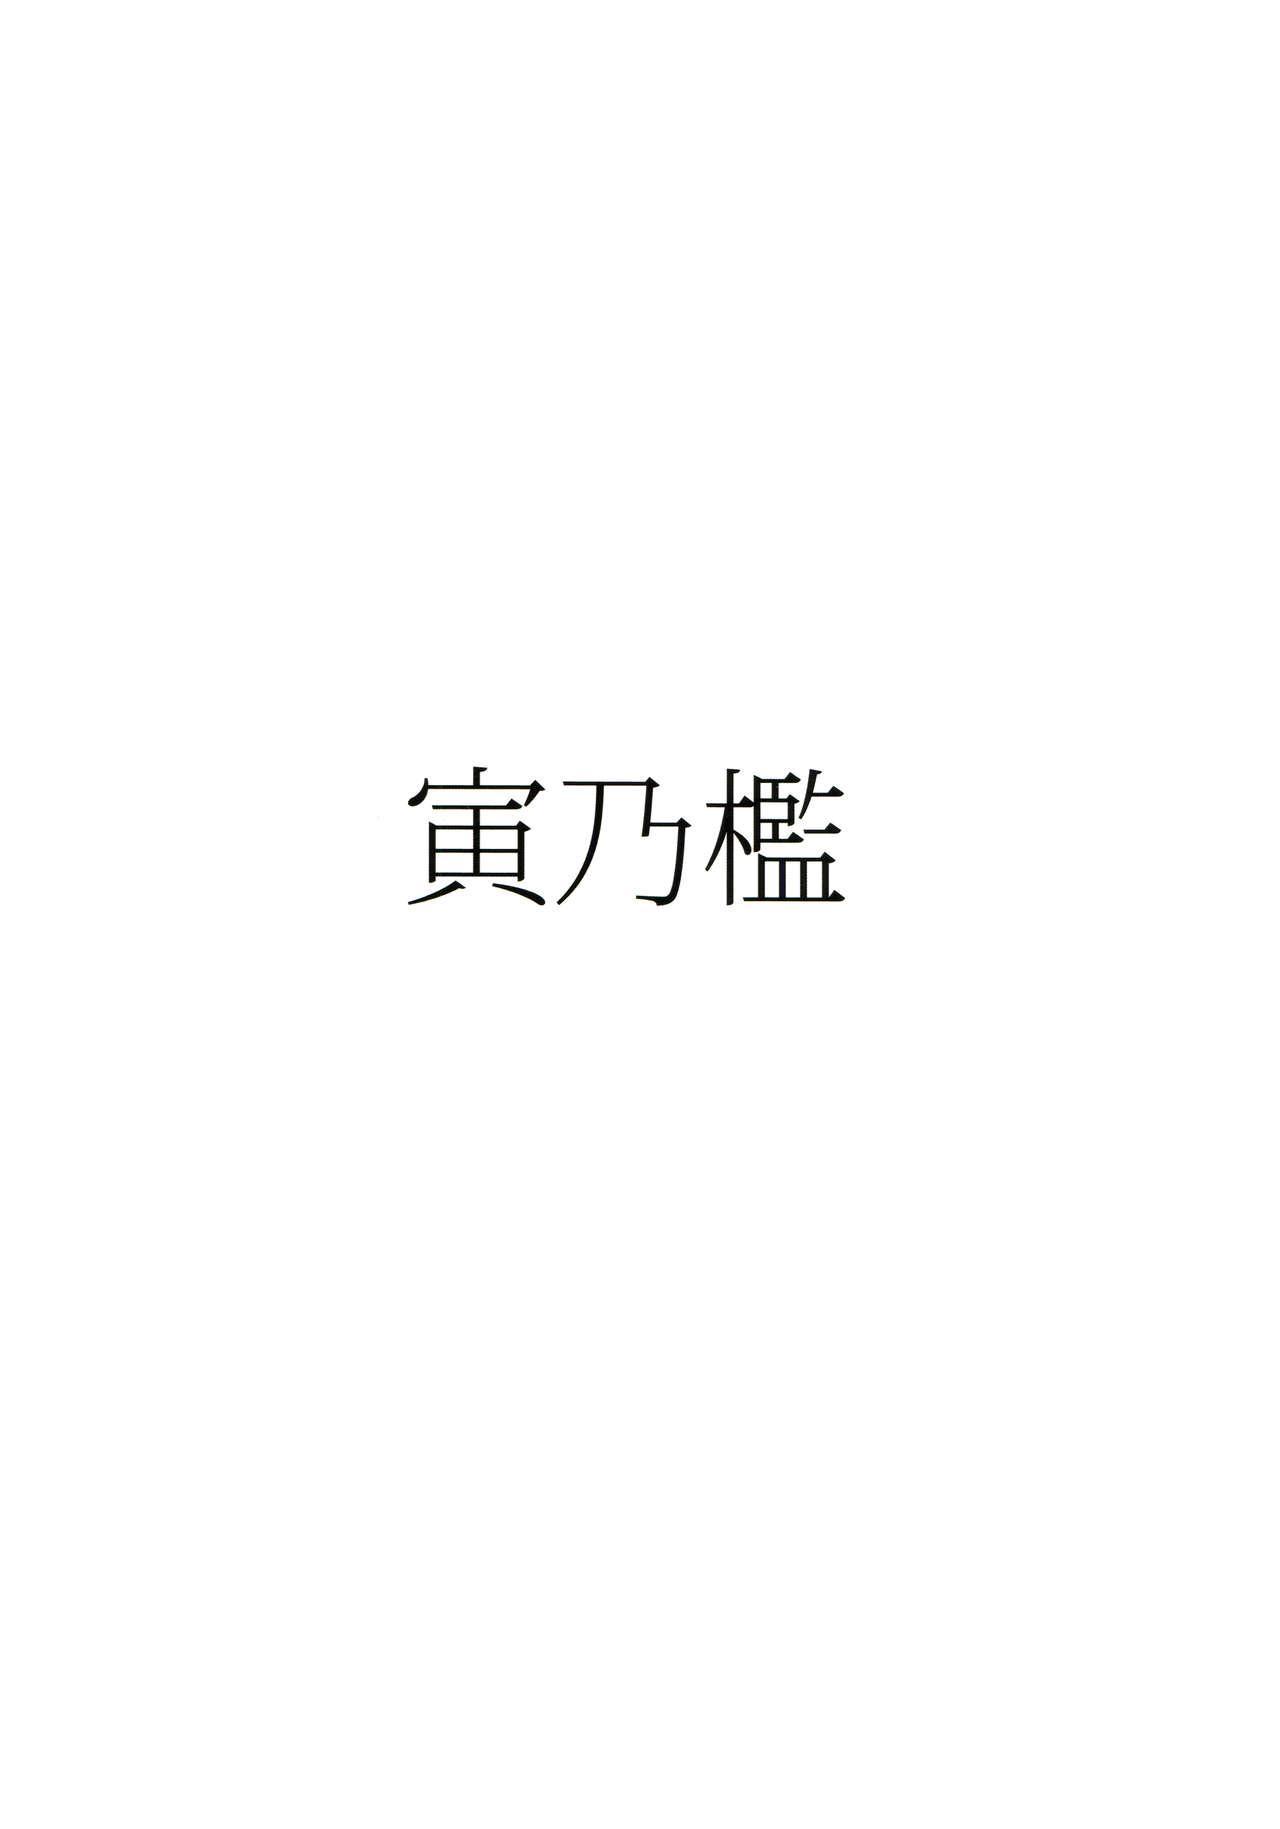 Onahobanki 21